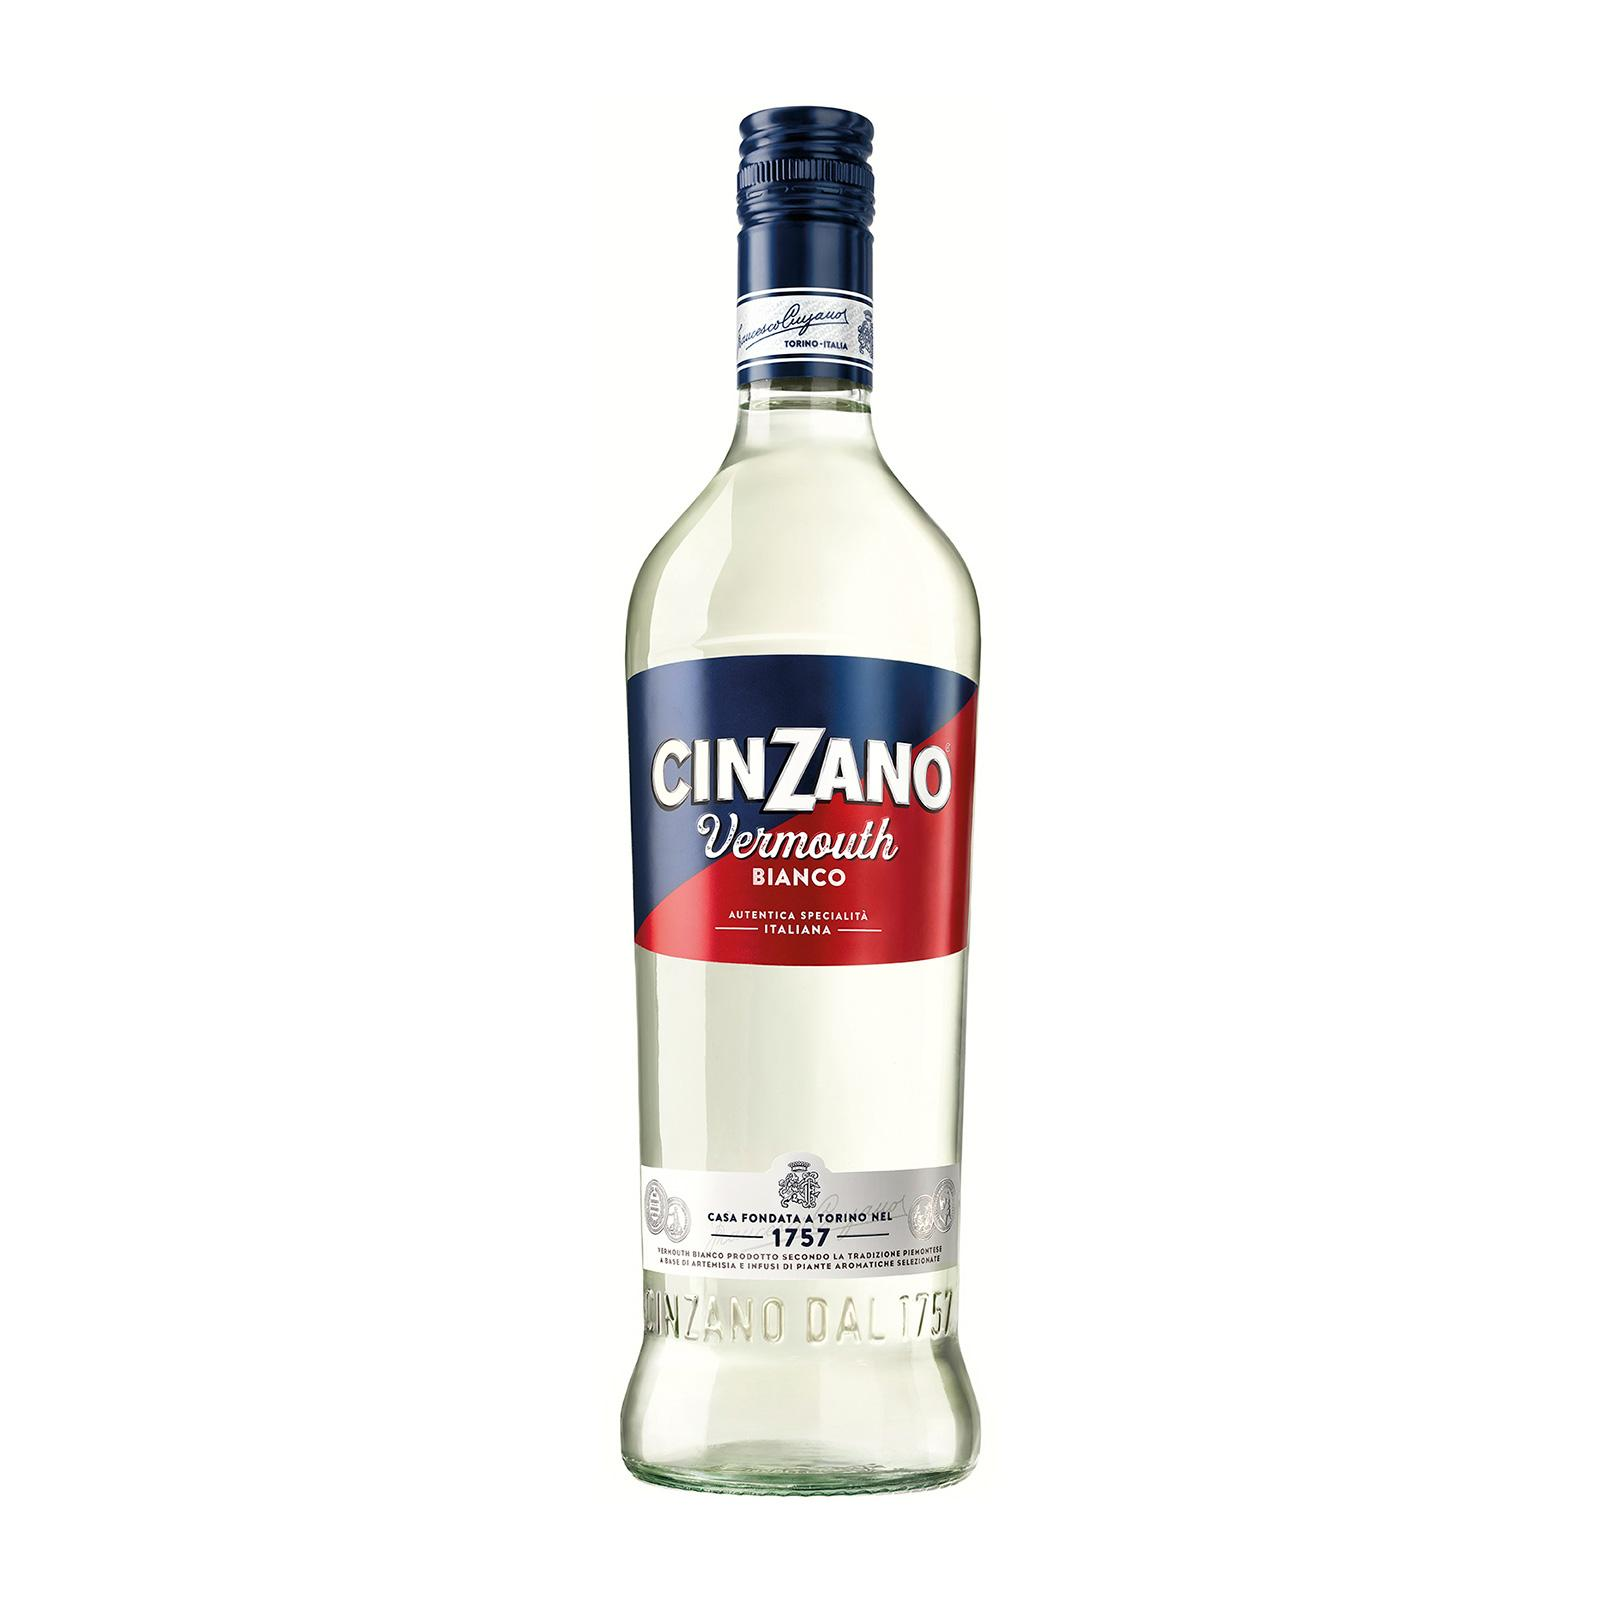 Cinzano Vermouth Bianco 750 mL